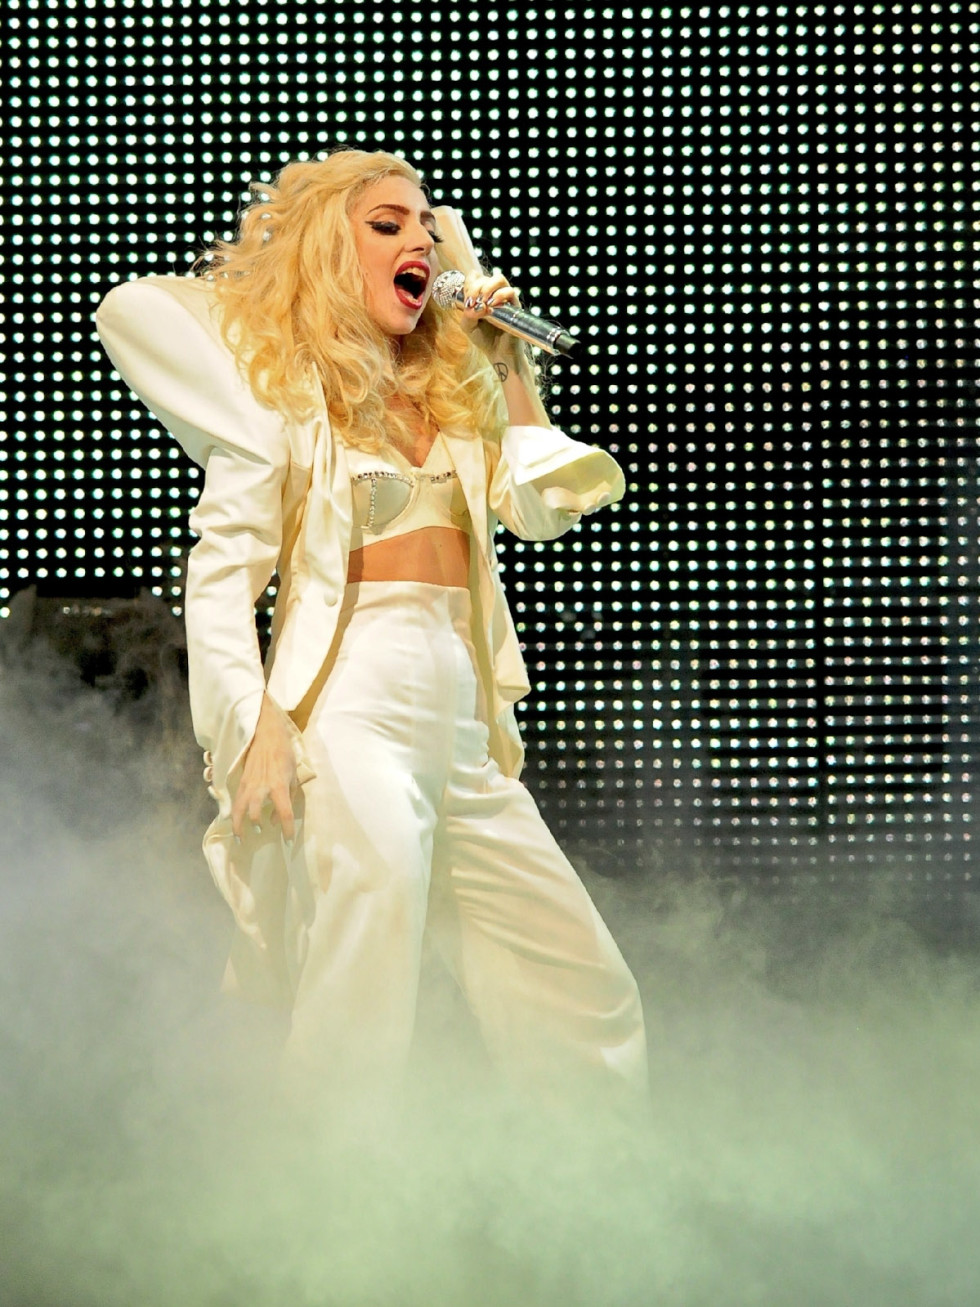 News_Michael D. Clark_concert pick_Lady Gaga_Monster Ball Tour